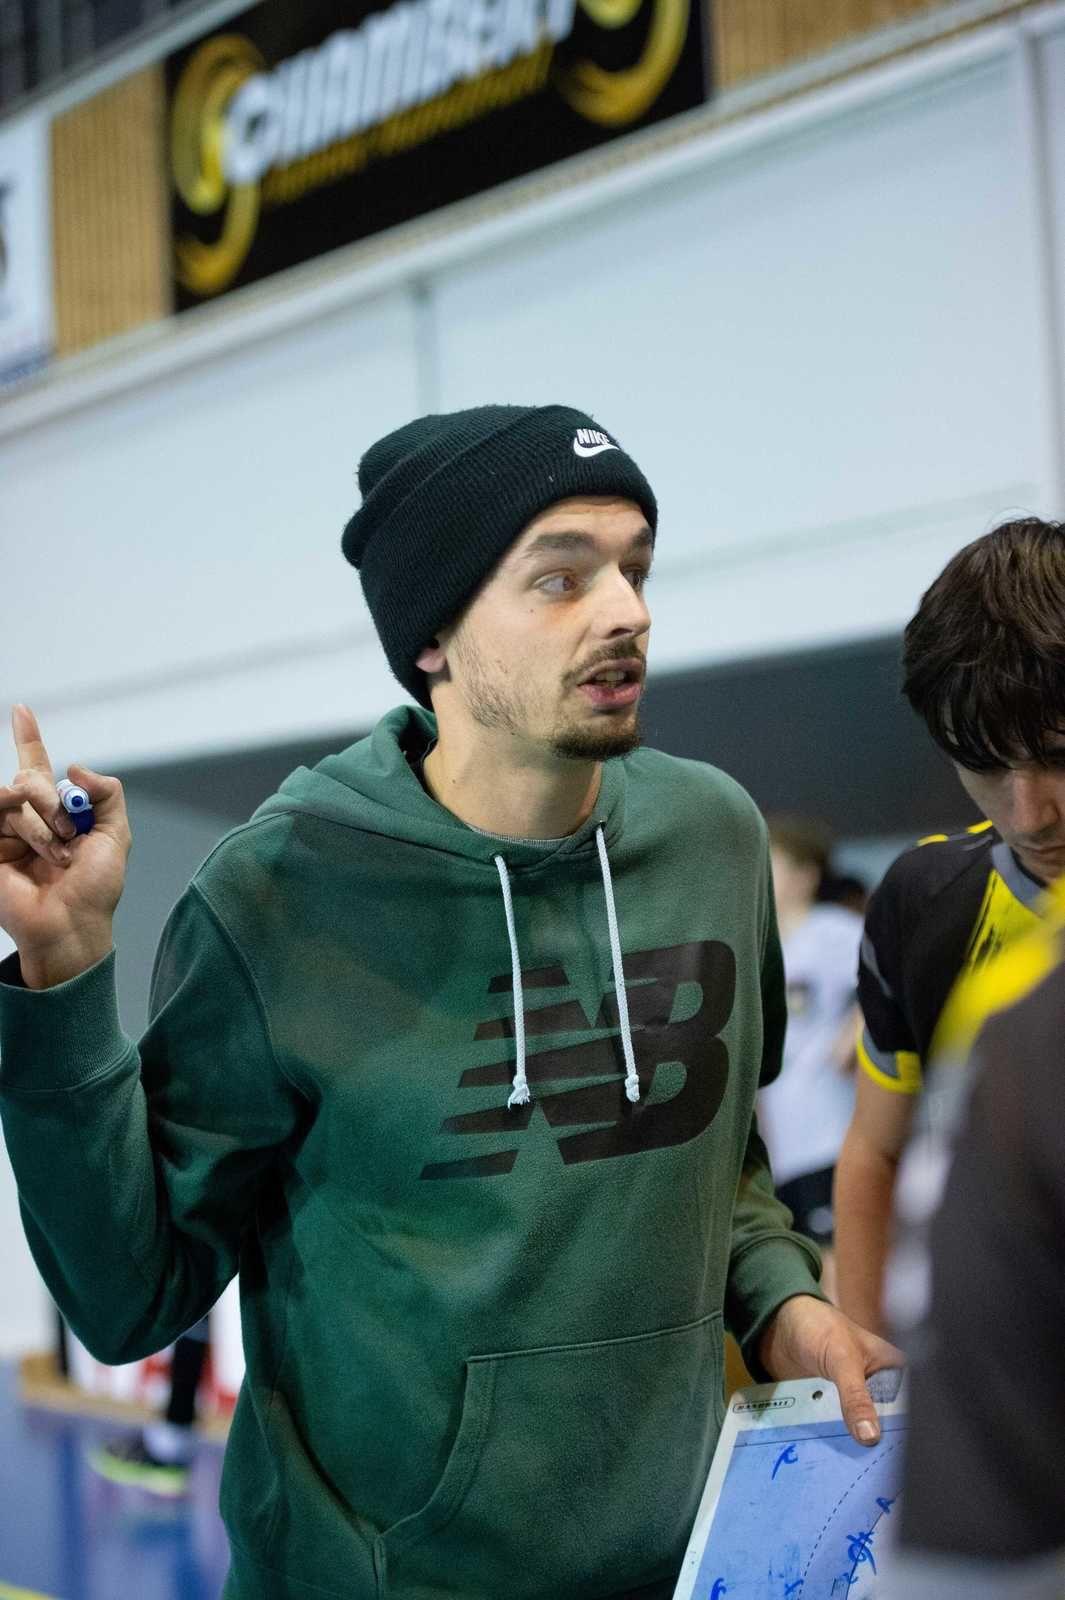 -18 AURA CHAMBERY facile contre le BOURGET samedi 9 novembre 2019 les photos du match